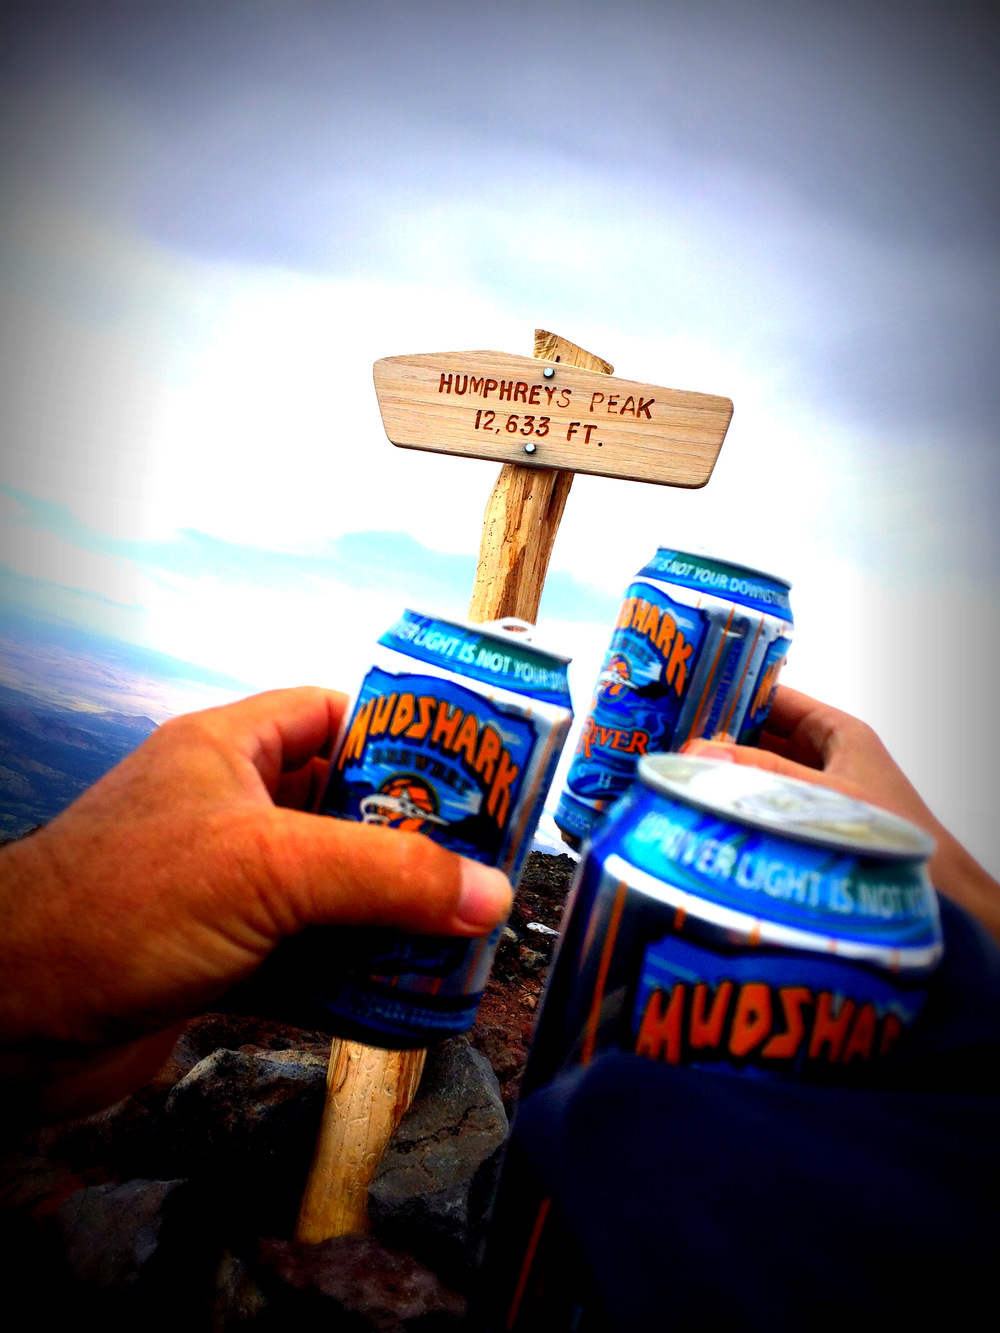 A Toast at Humphrey's Peak